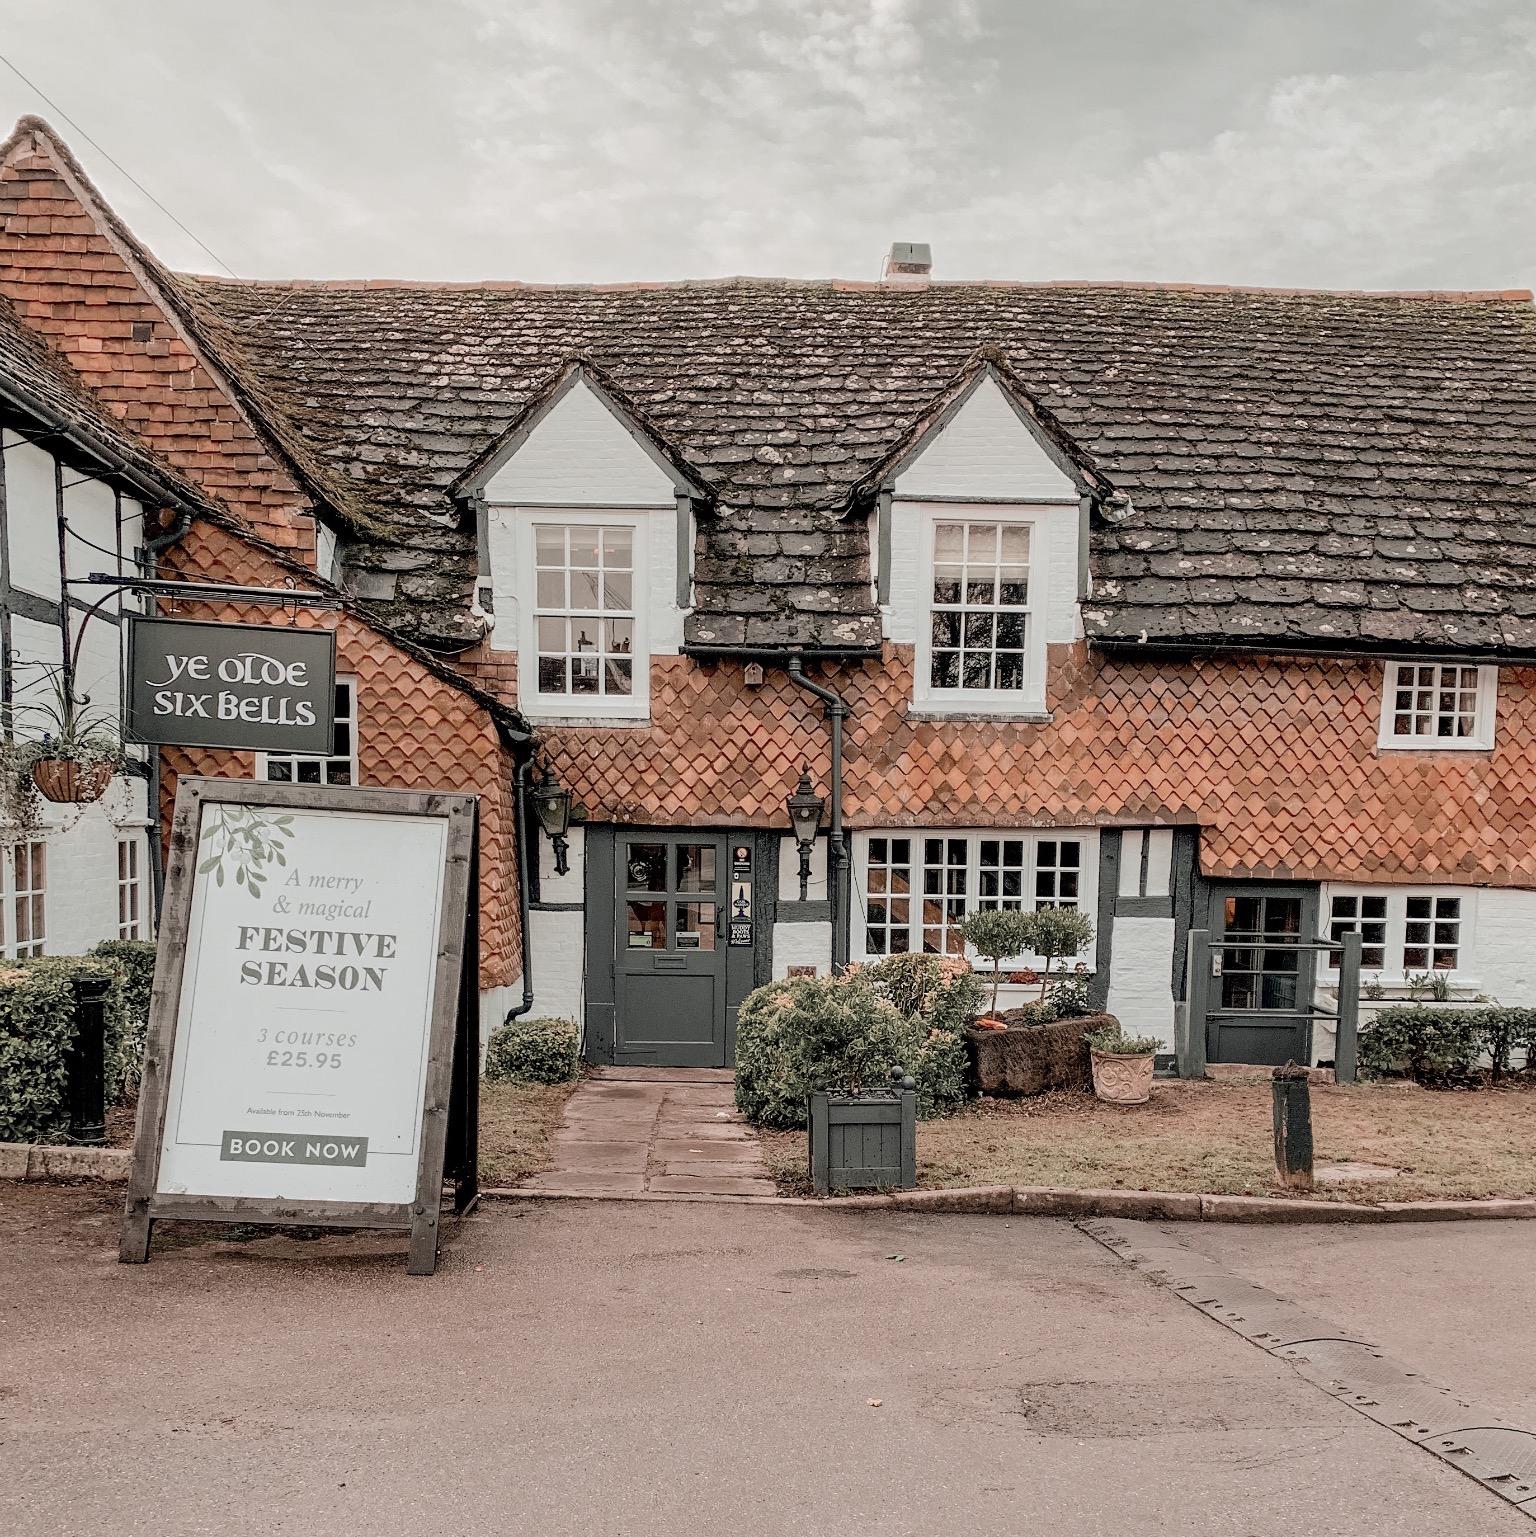 ye old six bells pub entrance